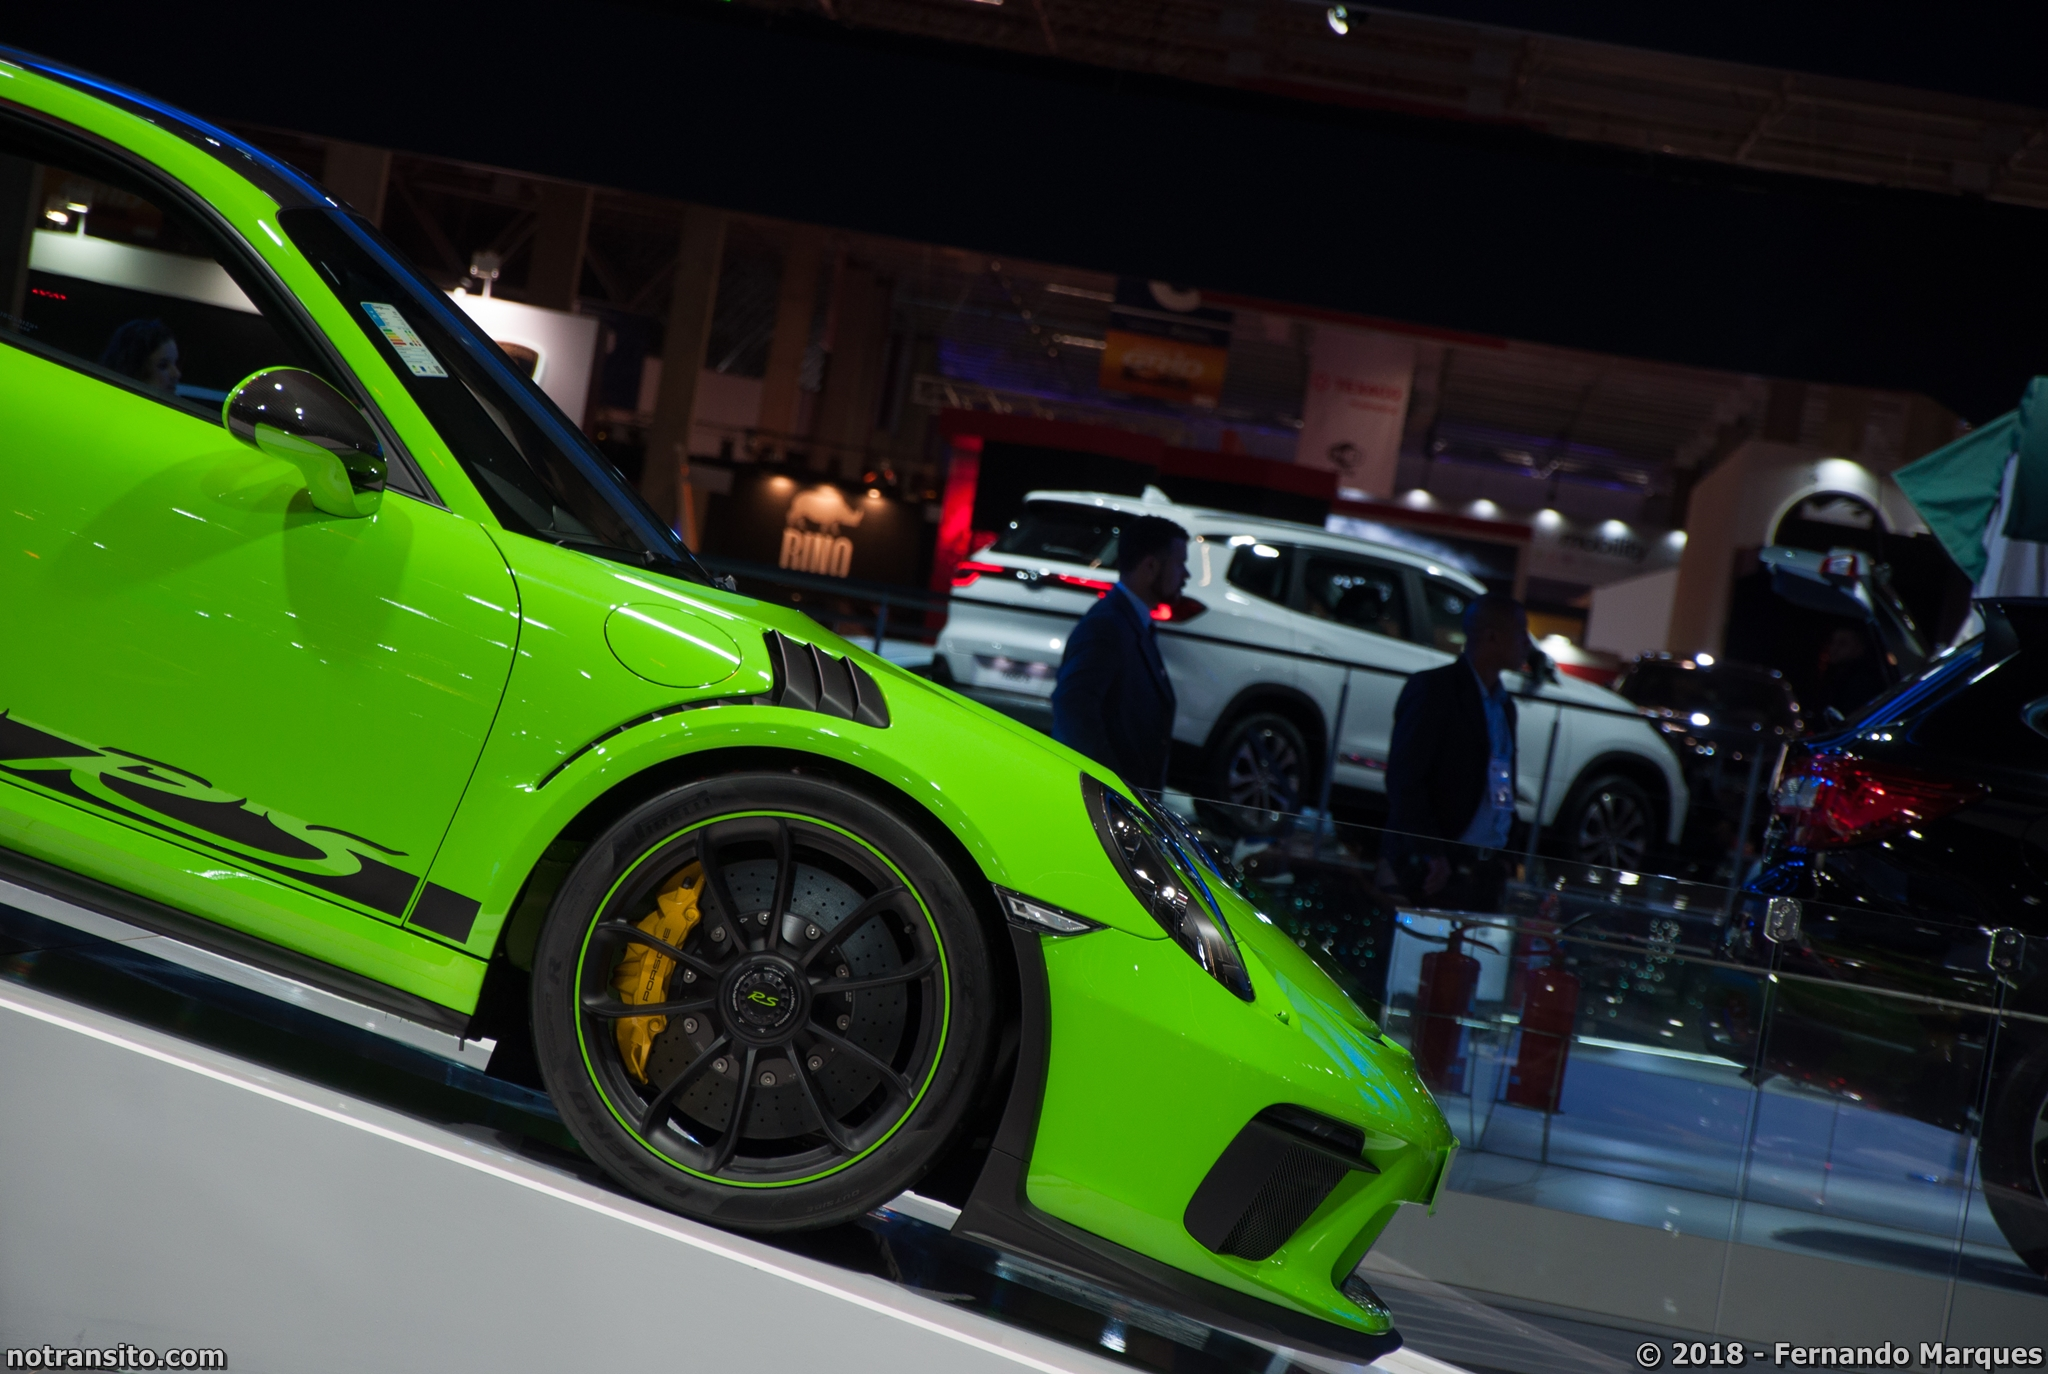 Salão2018-Porsche911GT3RS-03